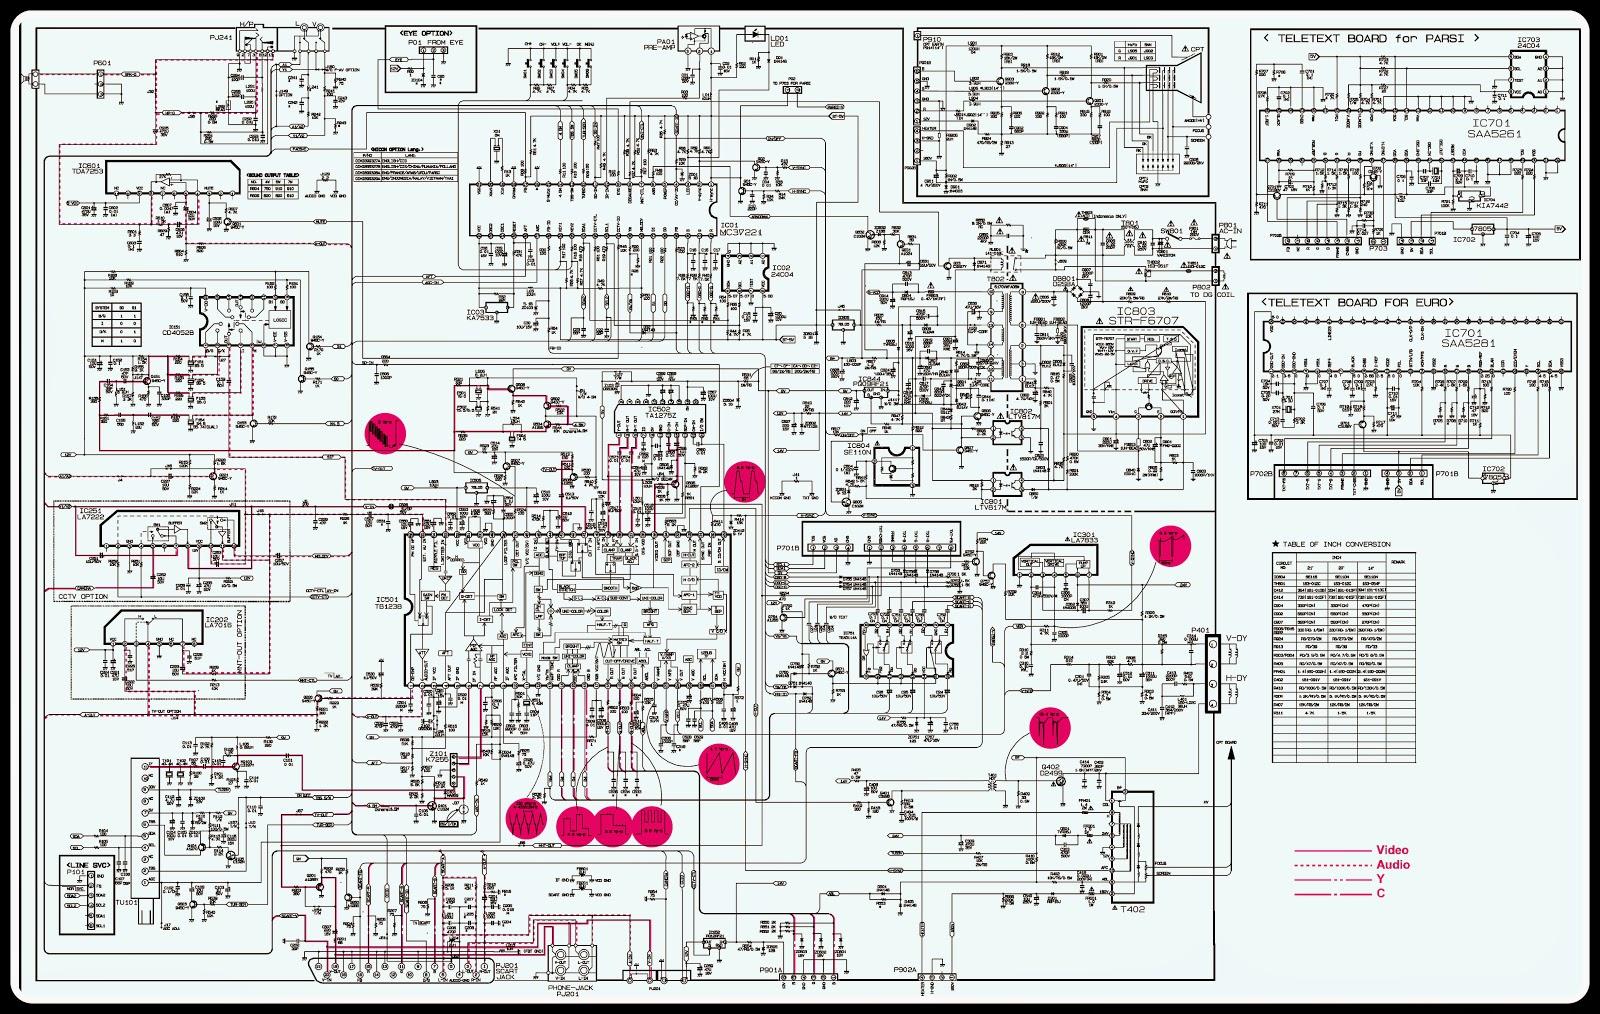 medium resolution of ge nautilus dishwasher wiring diagram images x jpeg kb ge microwave oven wiring diagram a guide